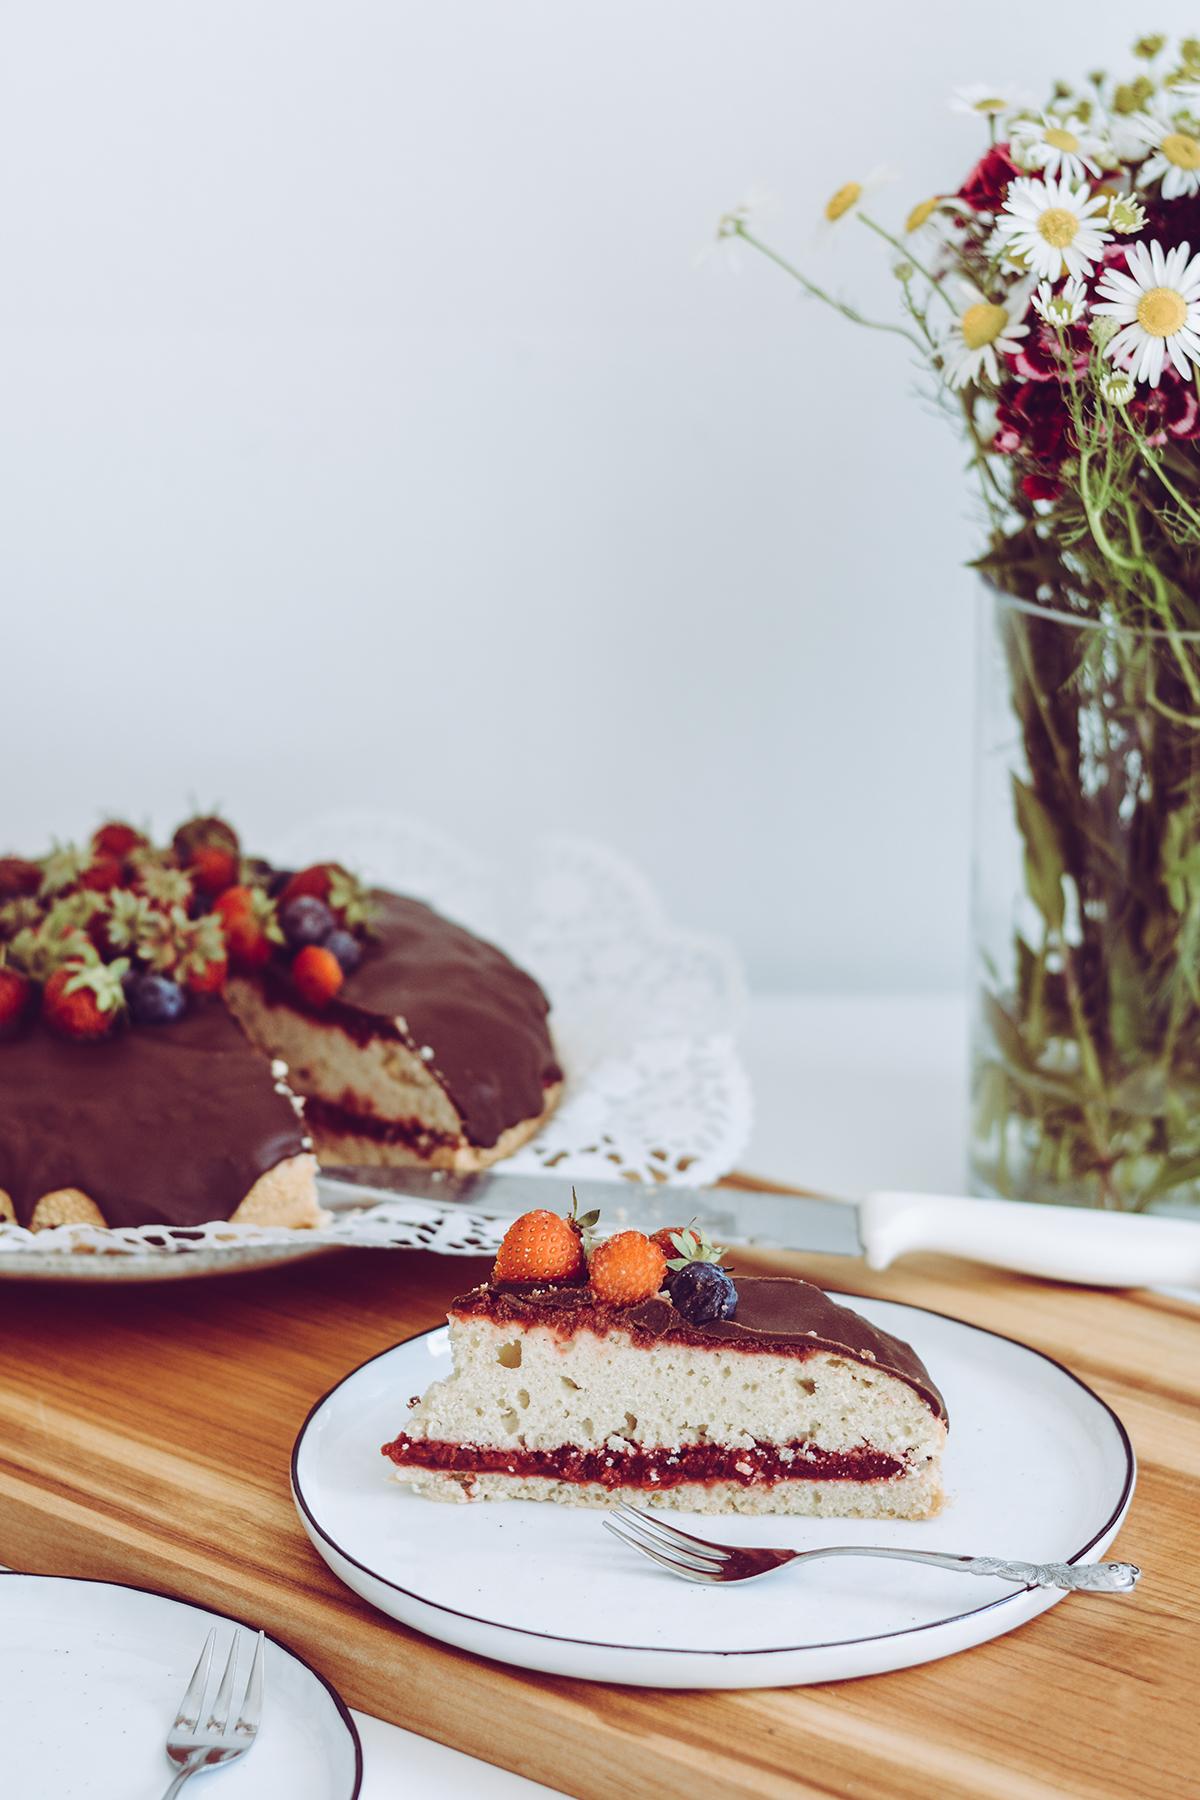 Vegane Erdbeer-Zitronentorte | Pixi mit Milch